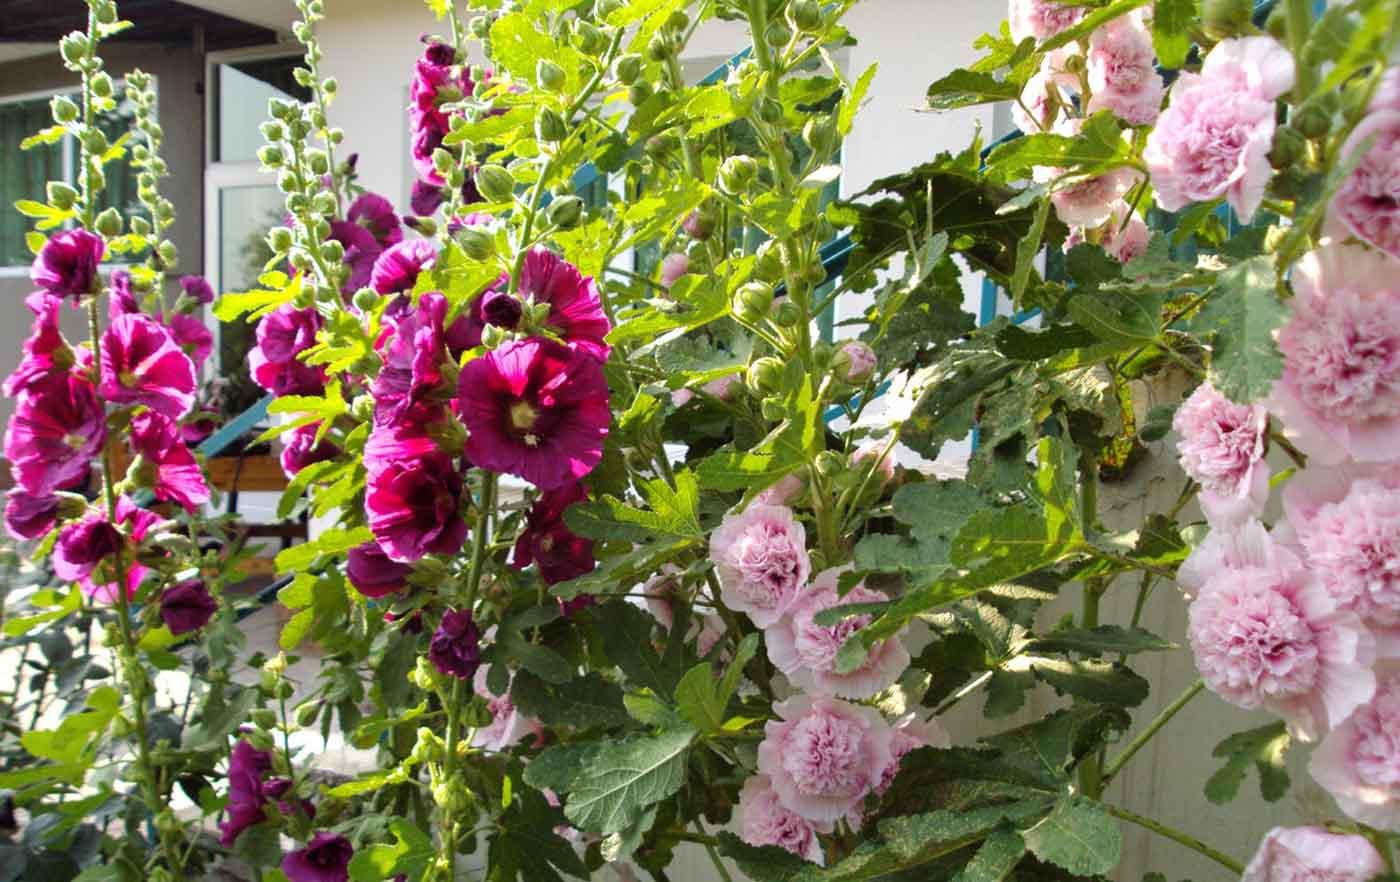 Шток роза: фото, посадка и уход за многолетним цветком